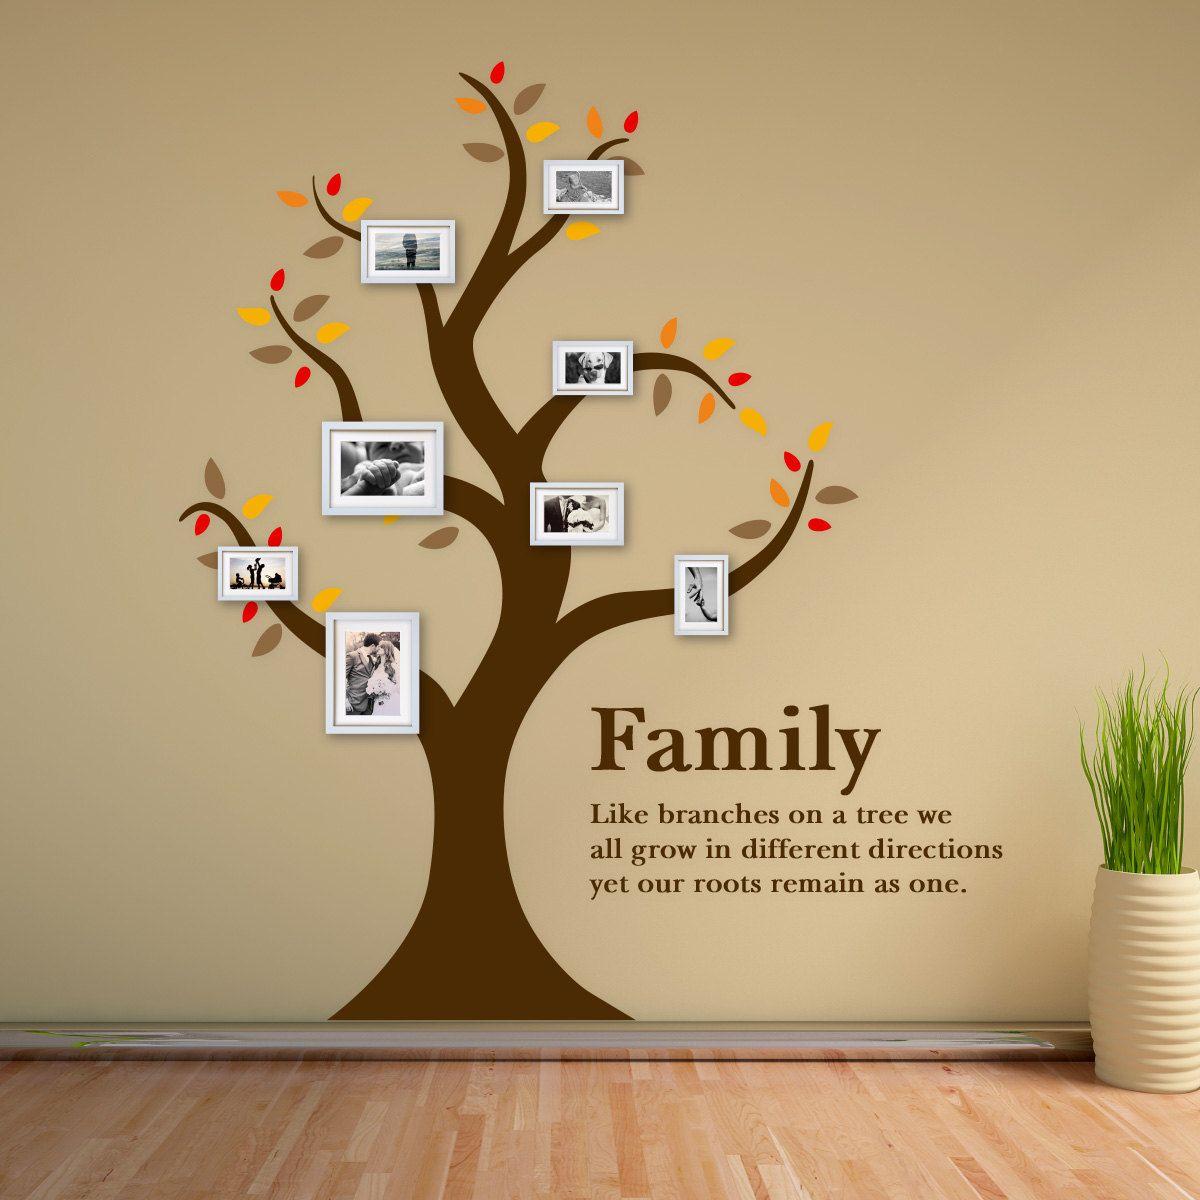 Family Tree Wall Sticker from The Binary Box by thebinarybox on Etsy ...